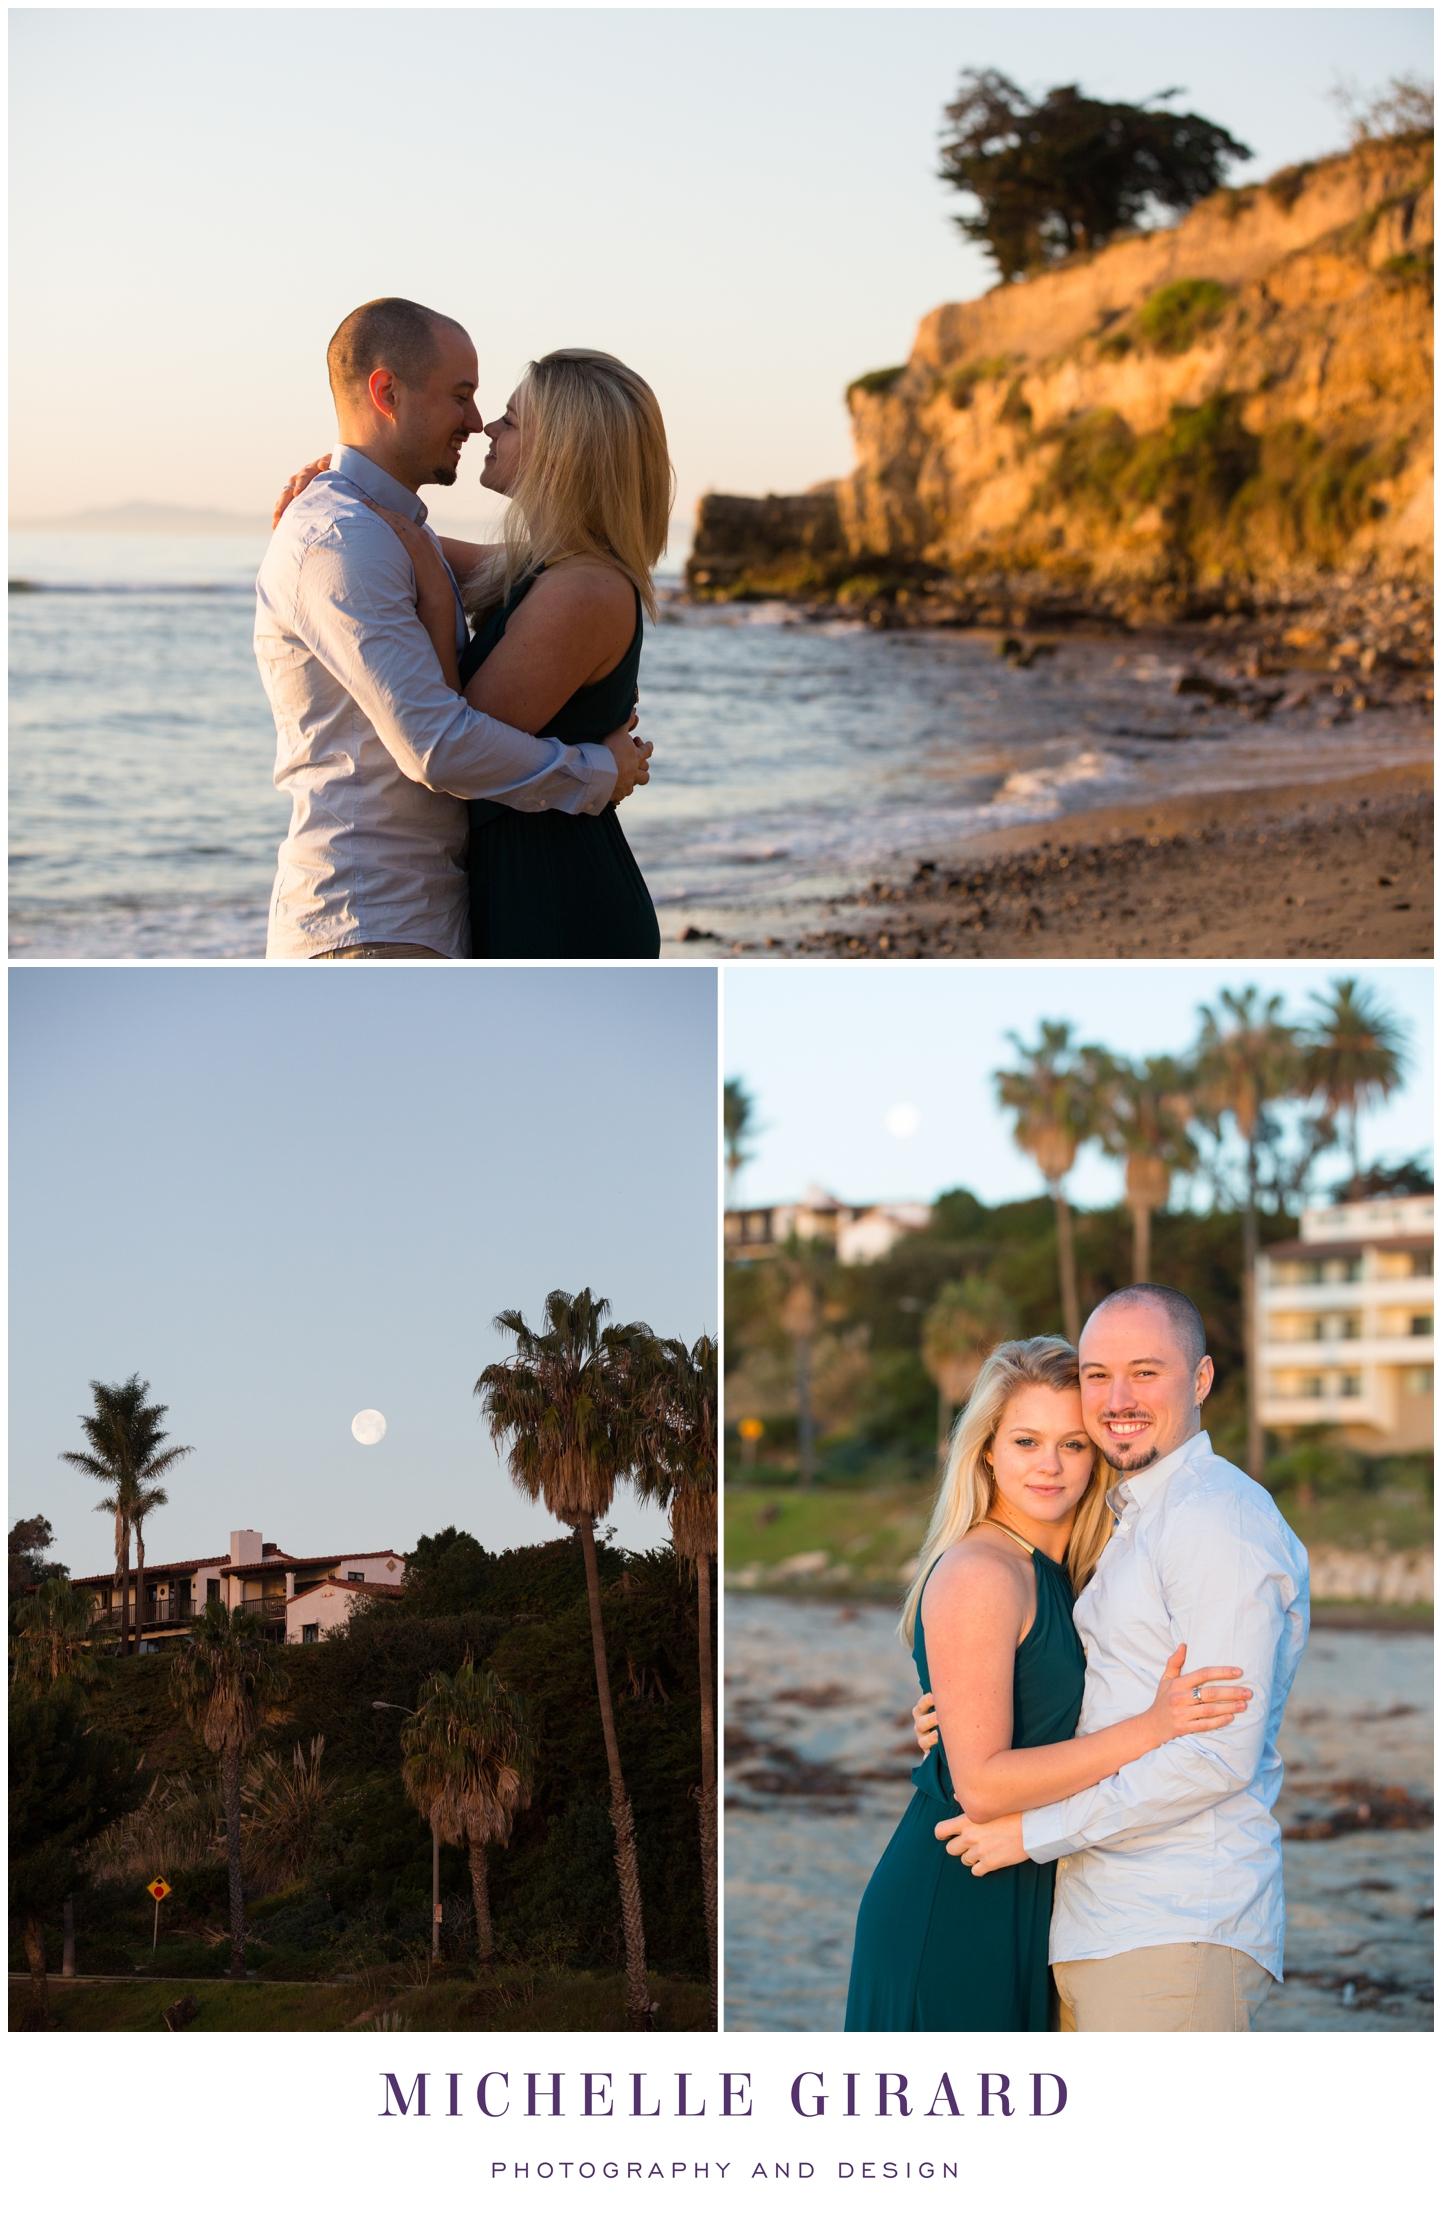 santa-barbara-california-engagement-photography-sunrise-theater-beach-michelle-girard04.jpg